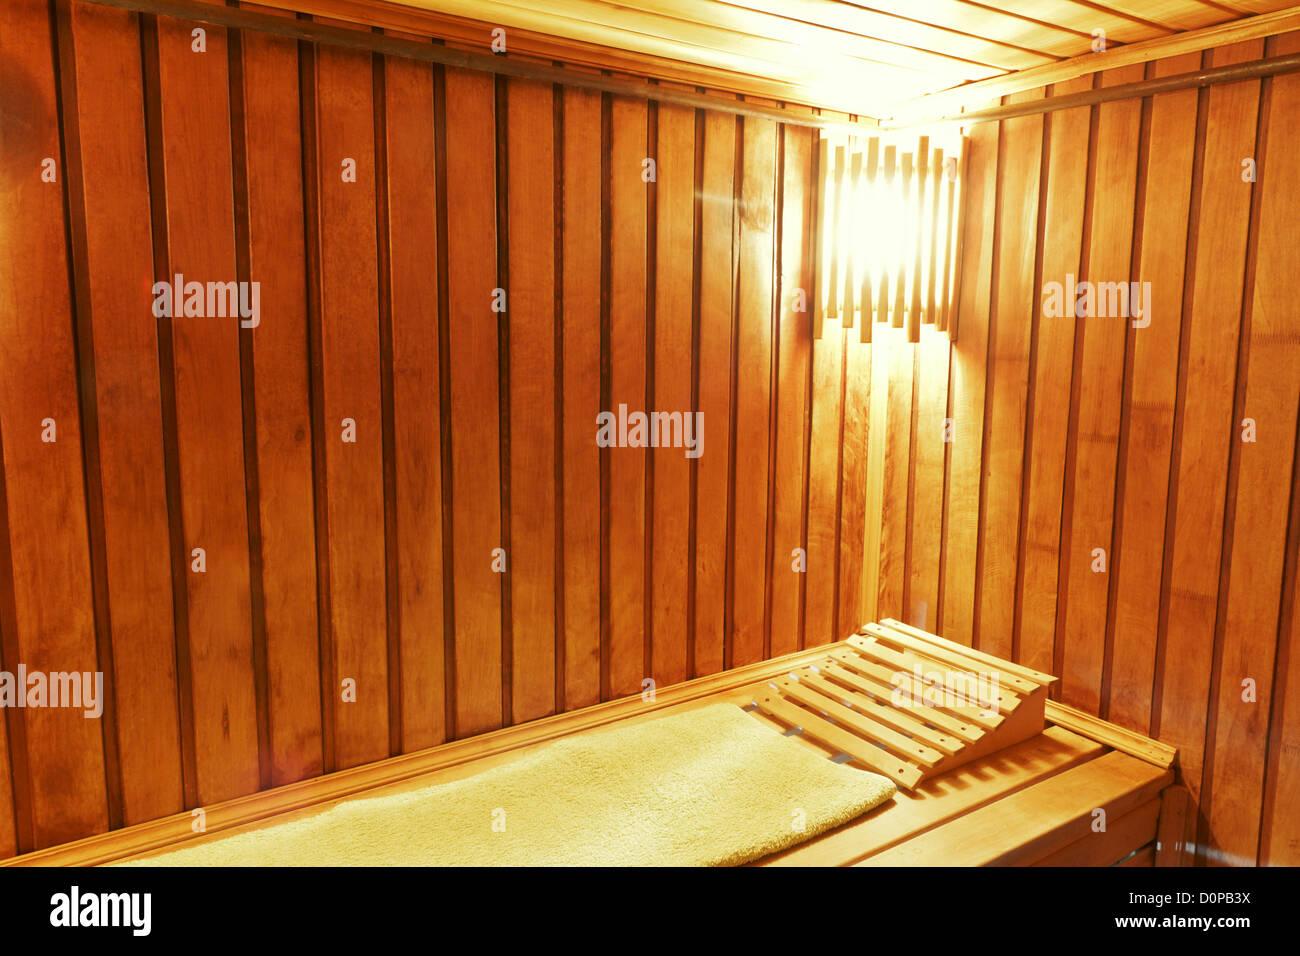 Wood cozy sauna room - Stock Image